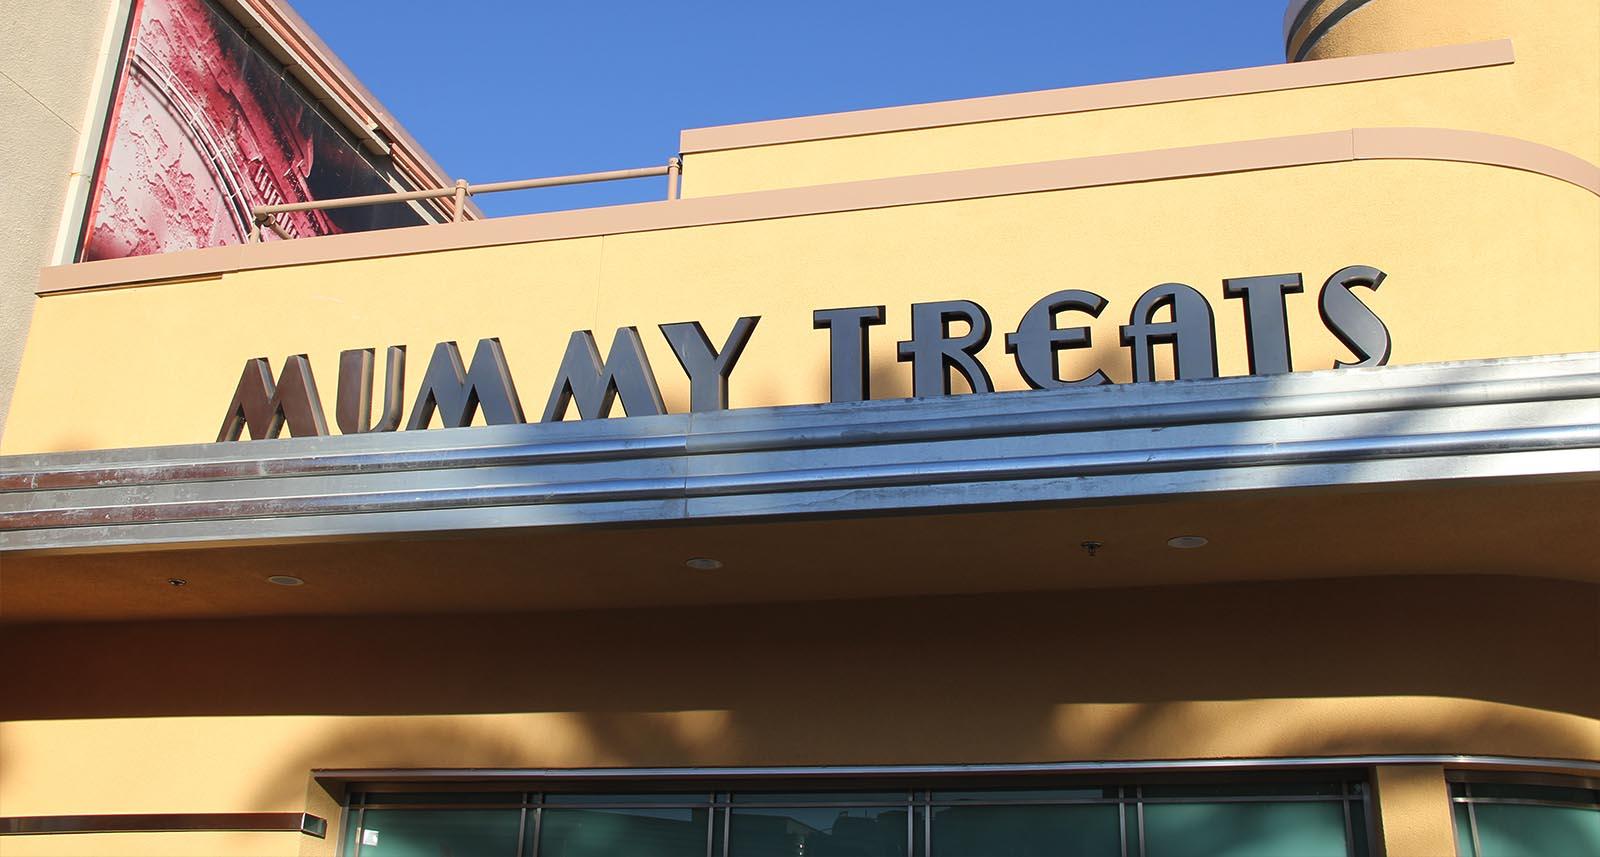 mummytreats